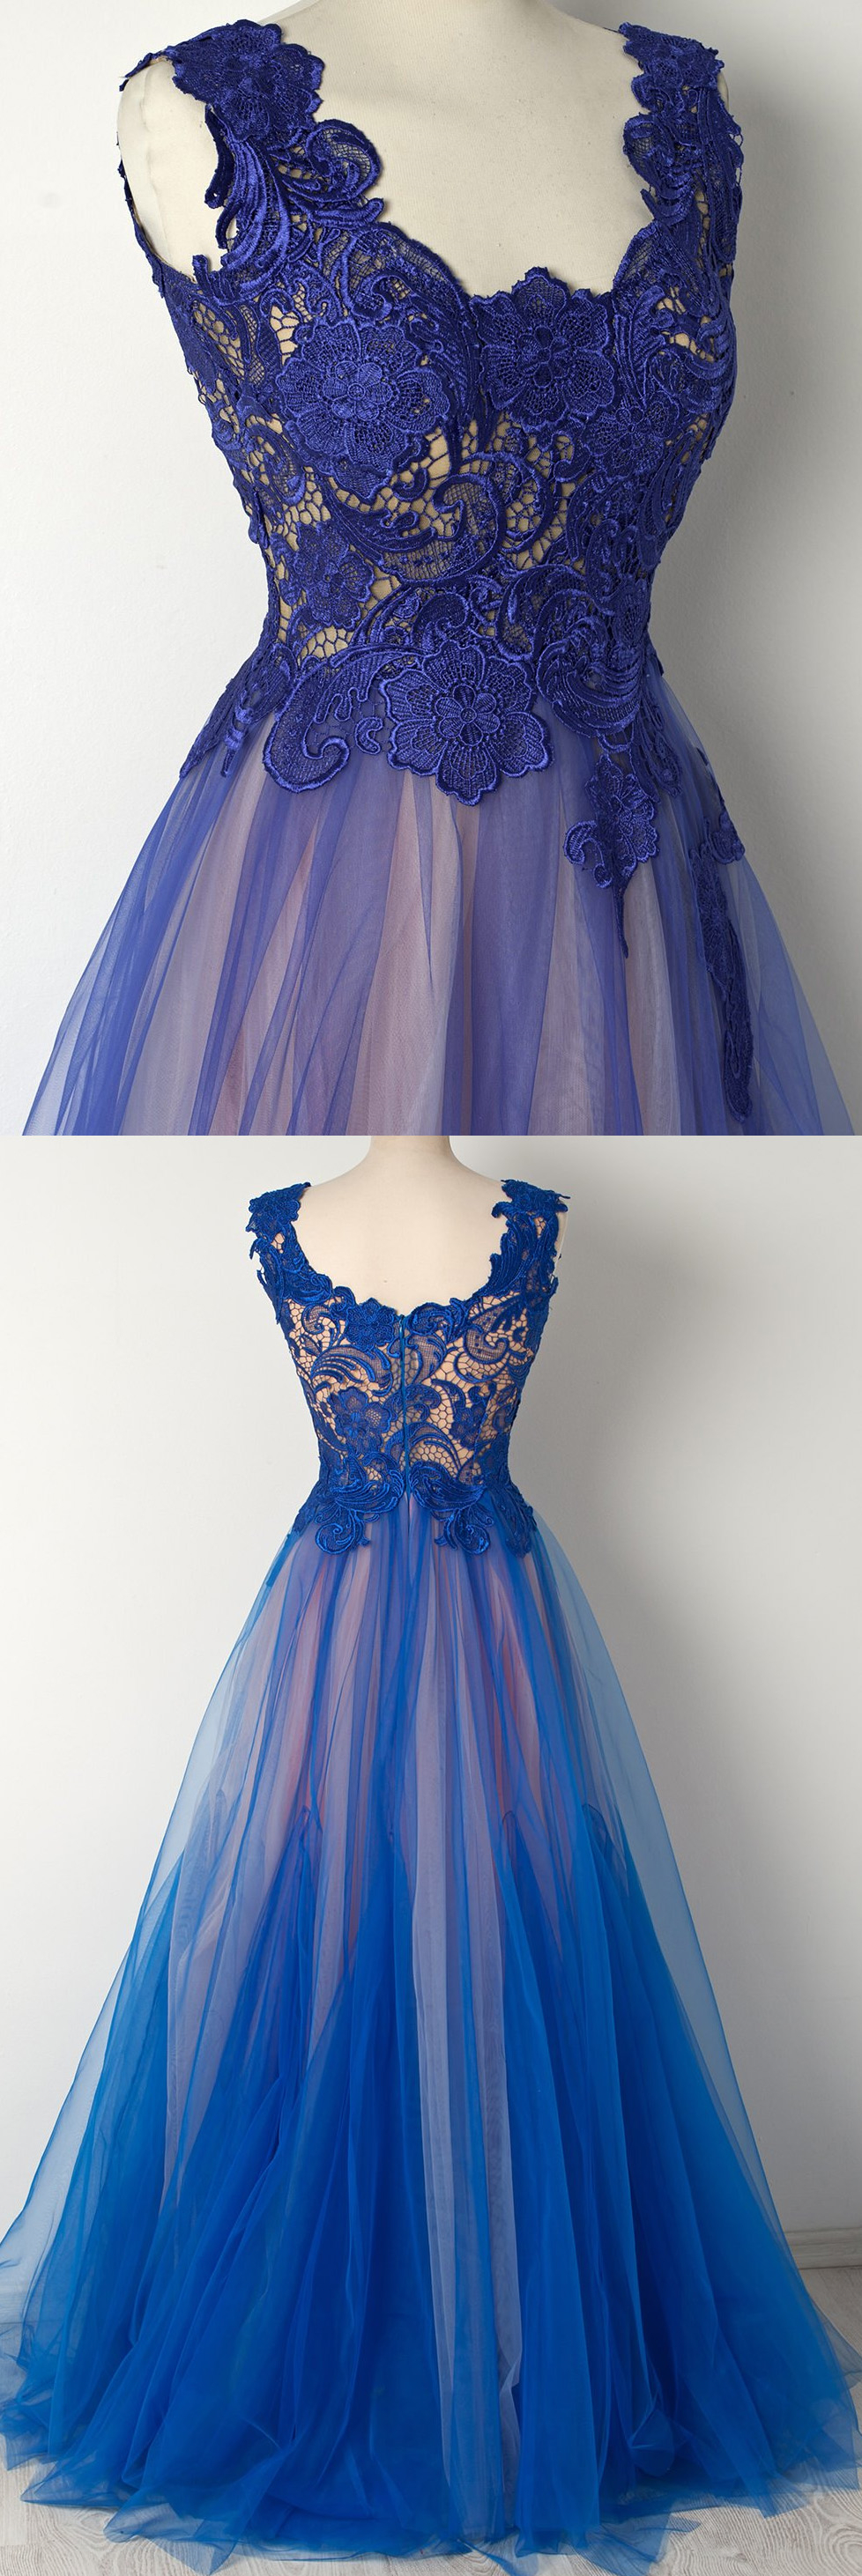 Square evening dresses royal blue long evening dresses lace chic